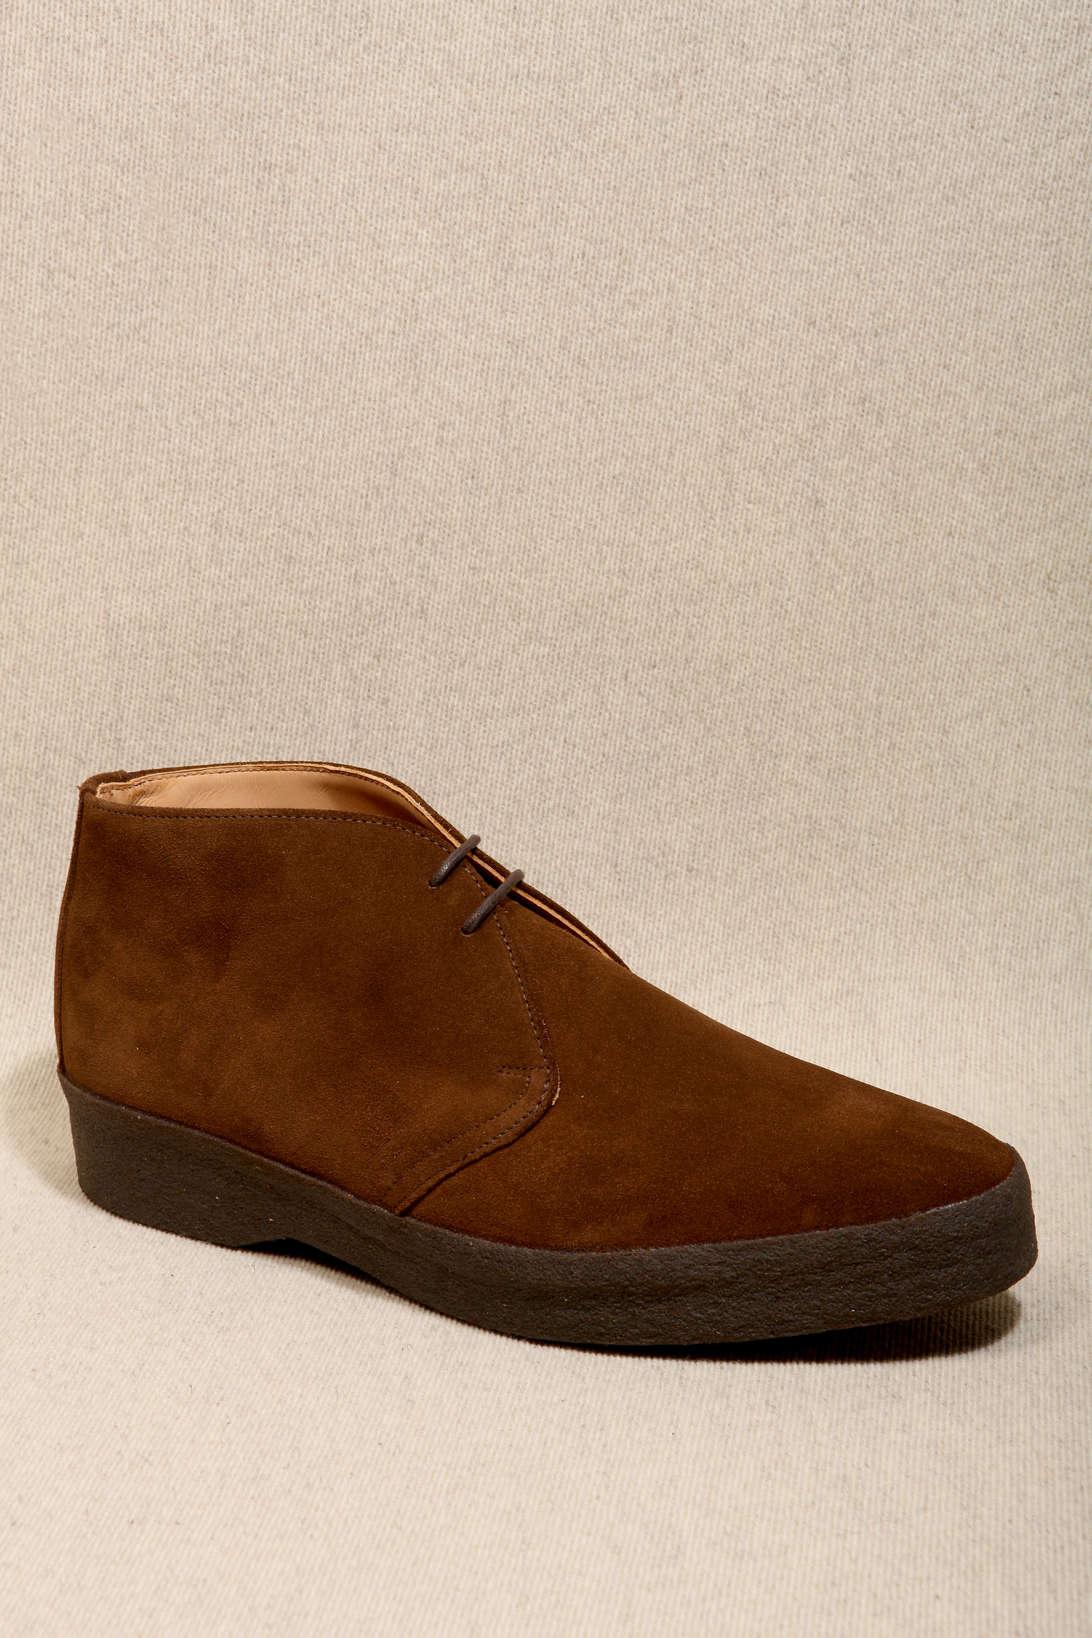 Sanders-playboy-boots-chaussures-Steve-mcqueen-1-lecatalog.com